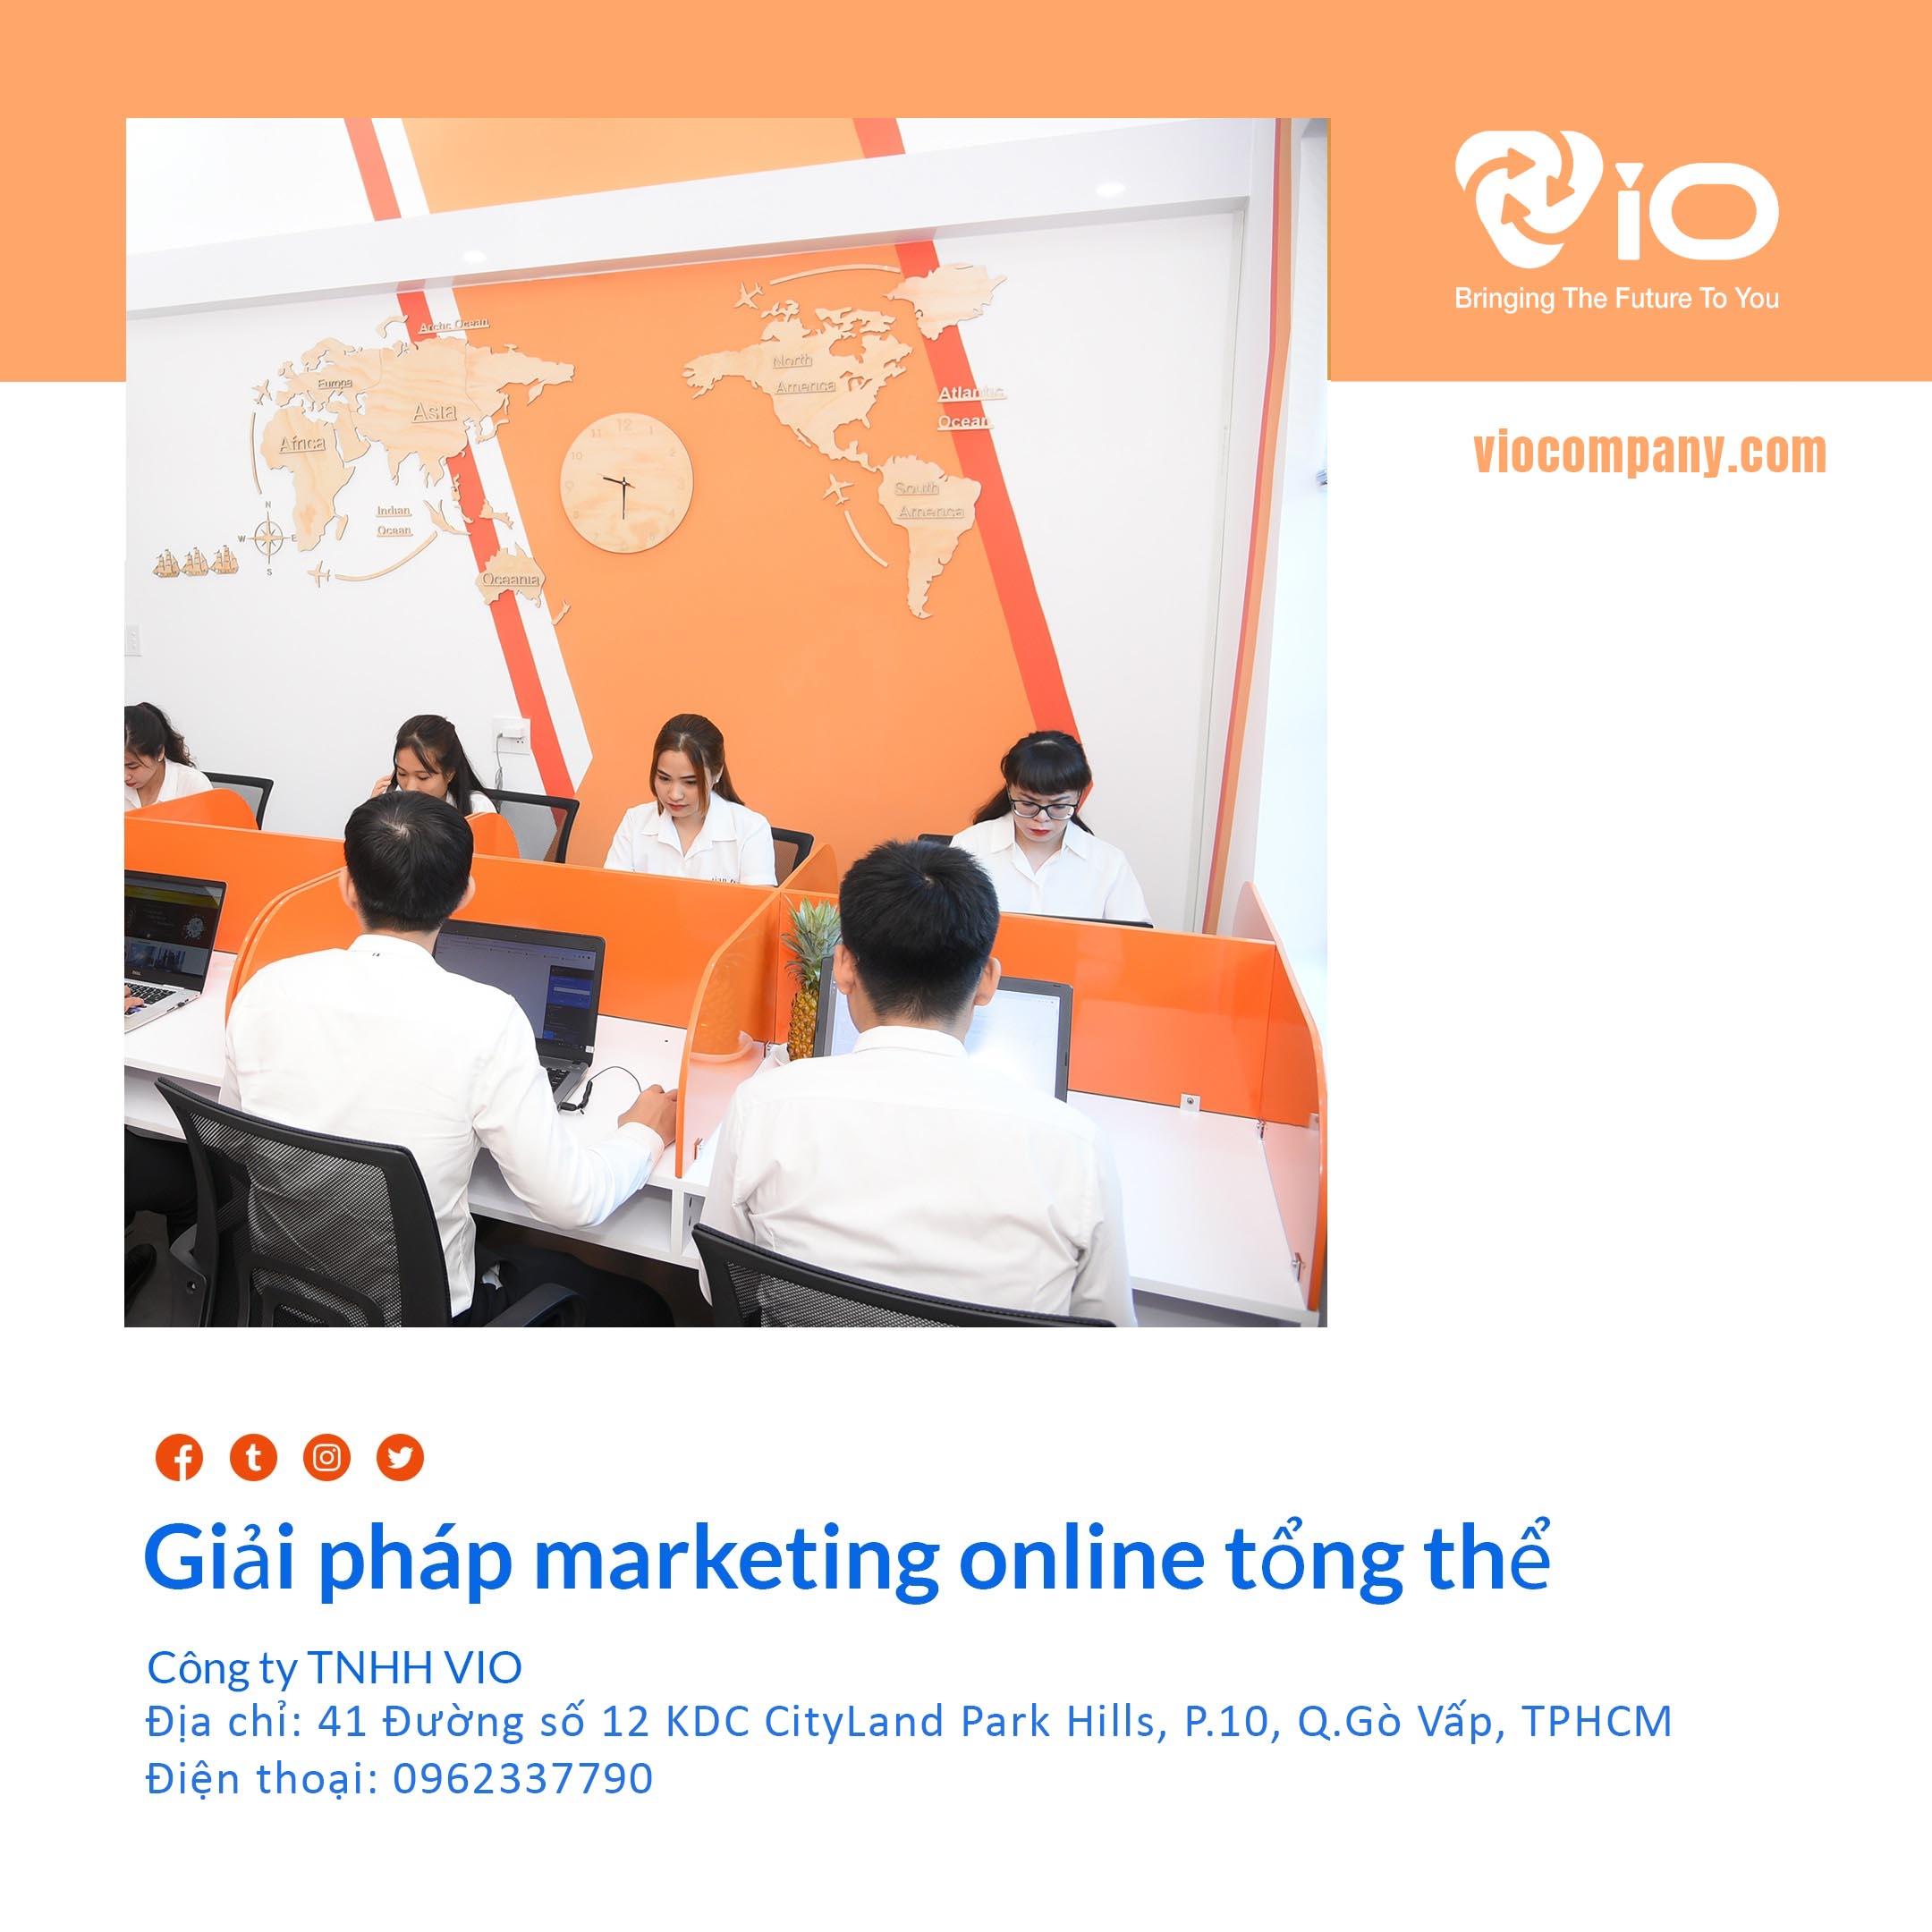 dich-vu-marketing-tong-the-vio-company